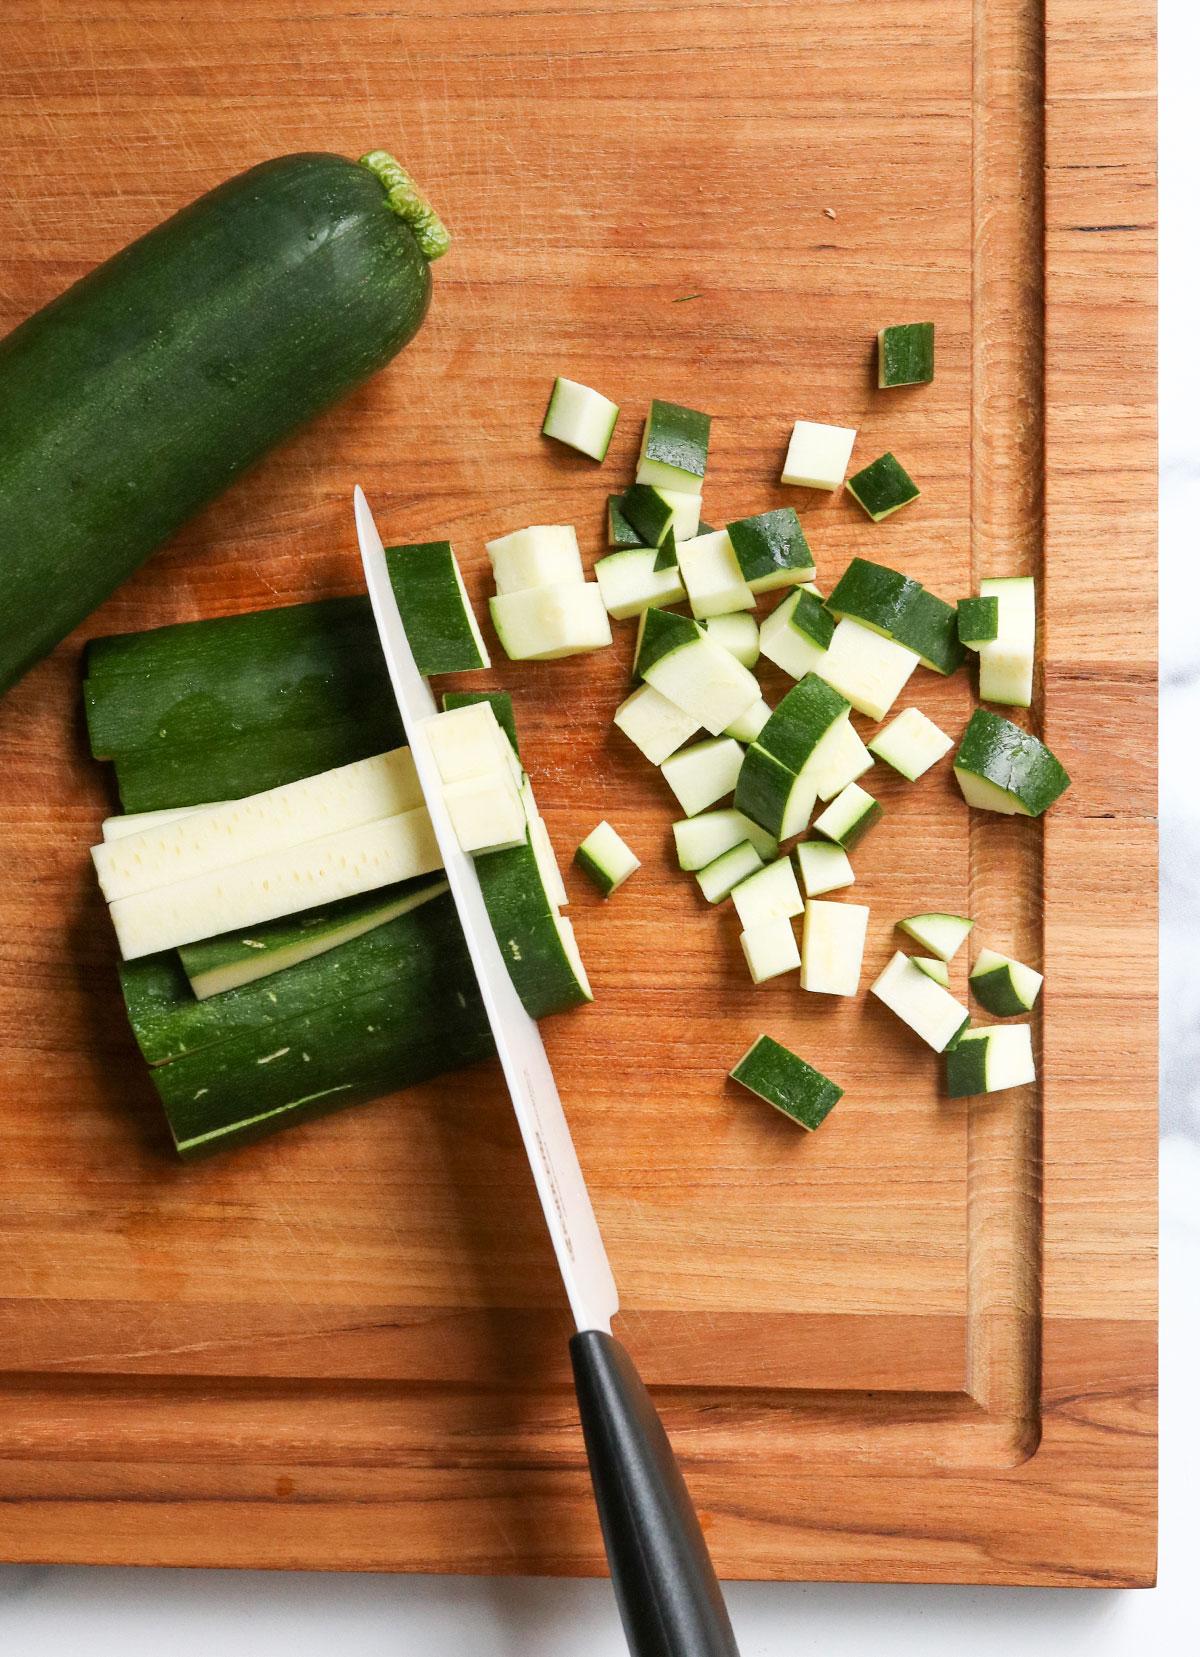 zucchini diced on cutting board